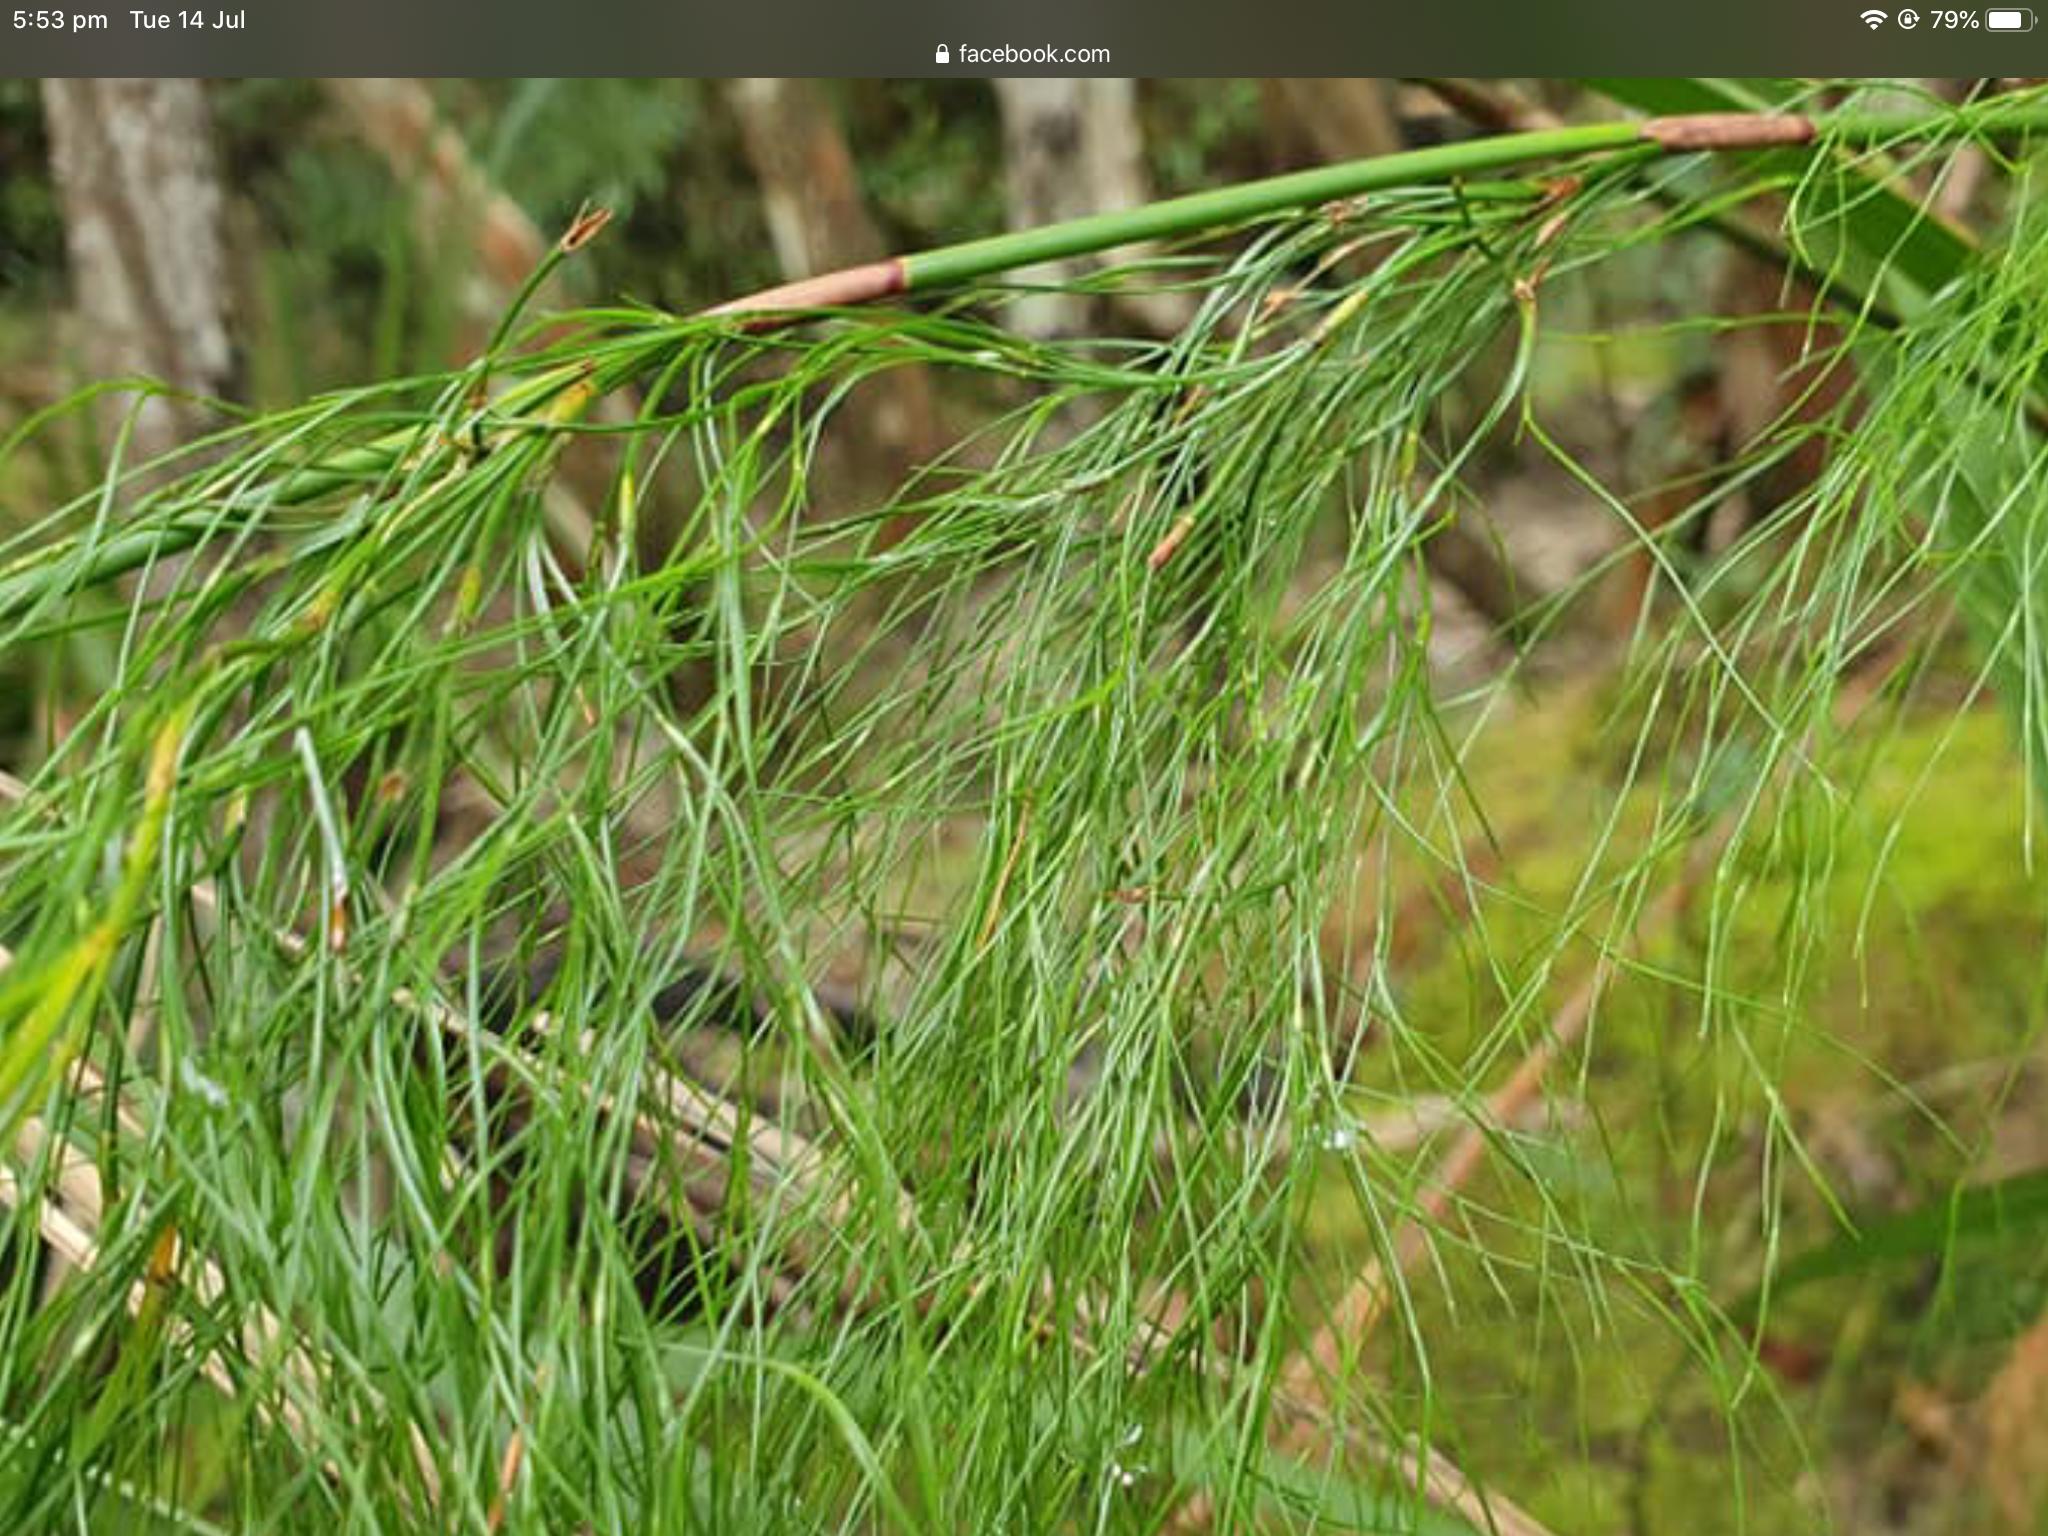 Baloskion tetraphyllum in 2020 Herbs, Grass, Wetland